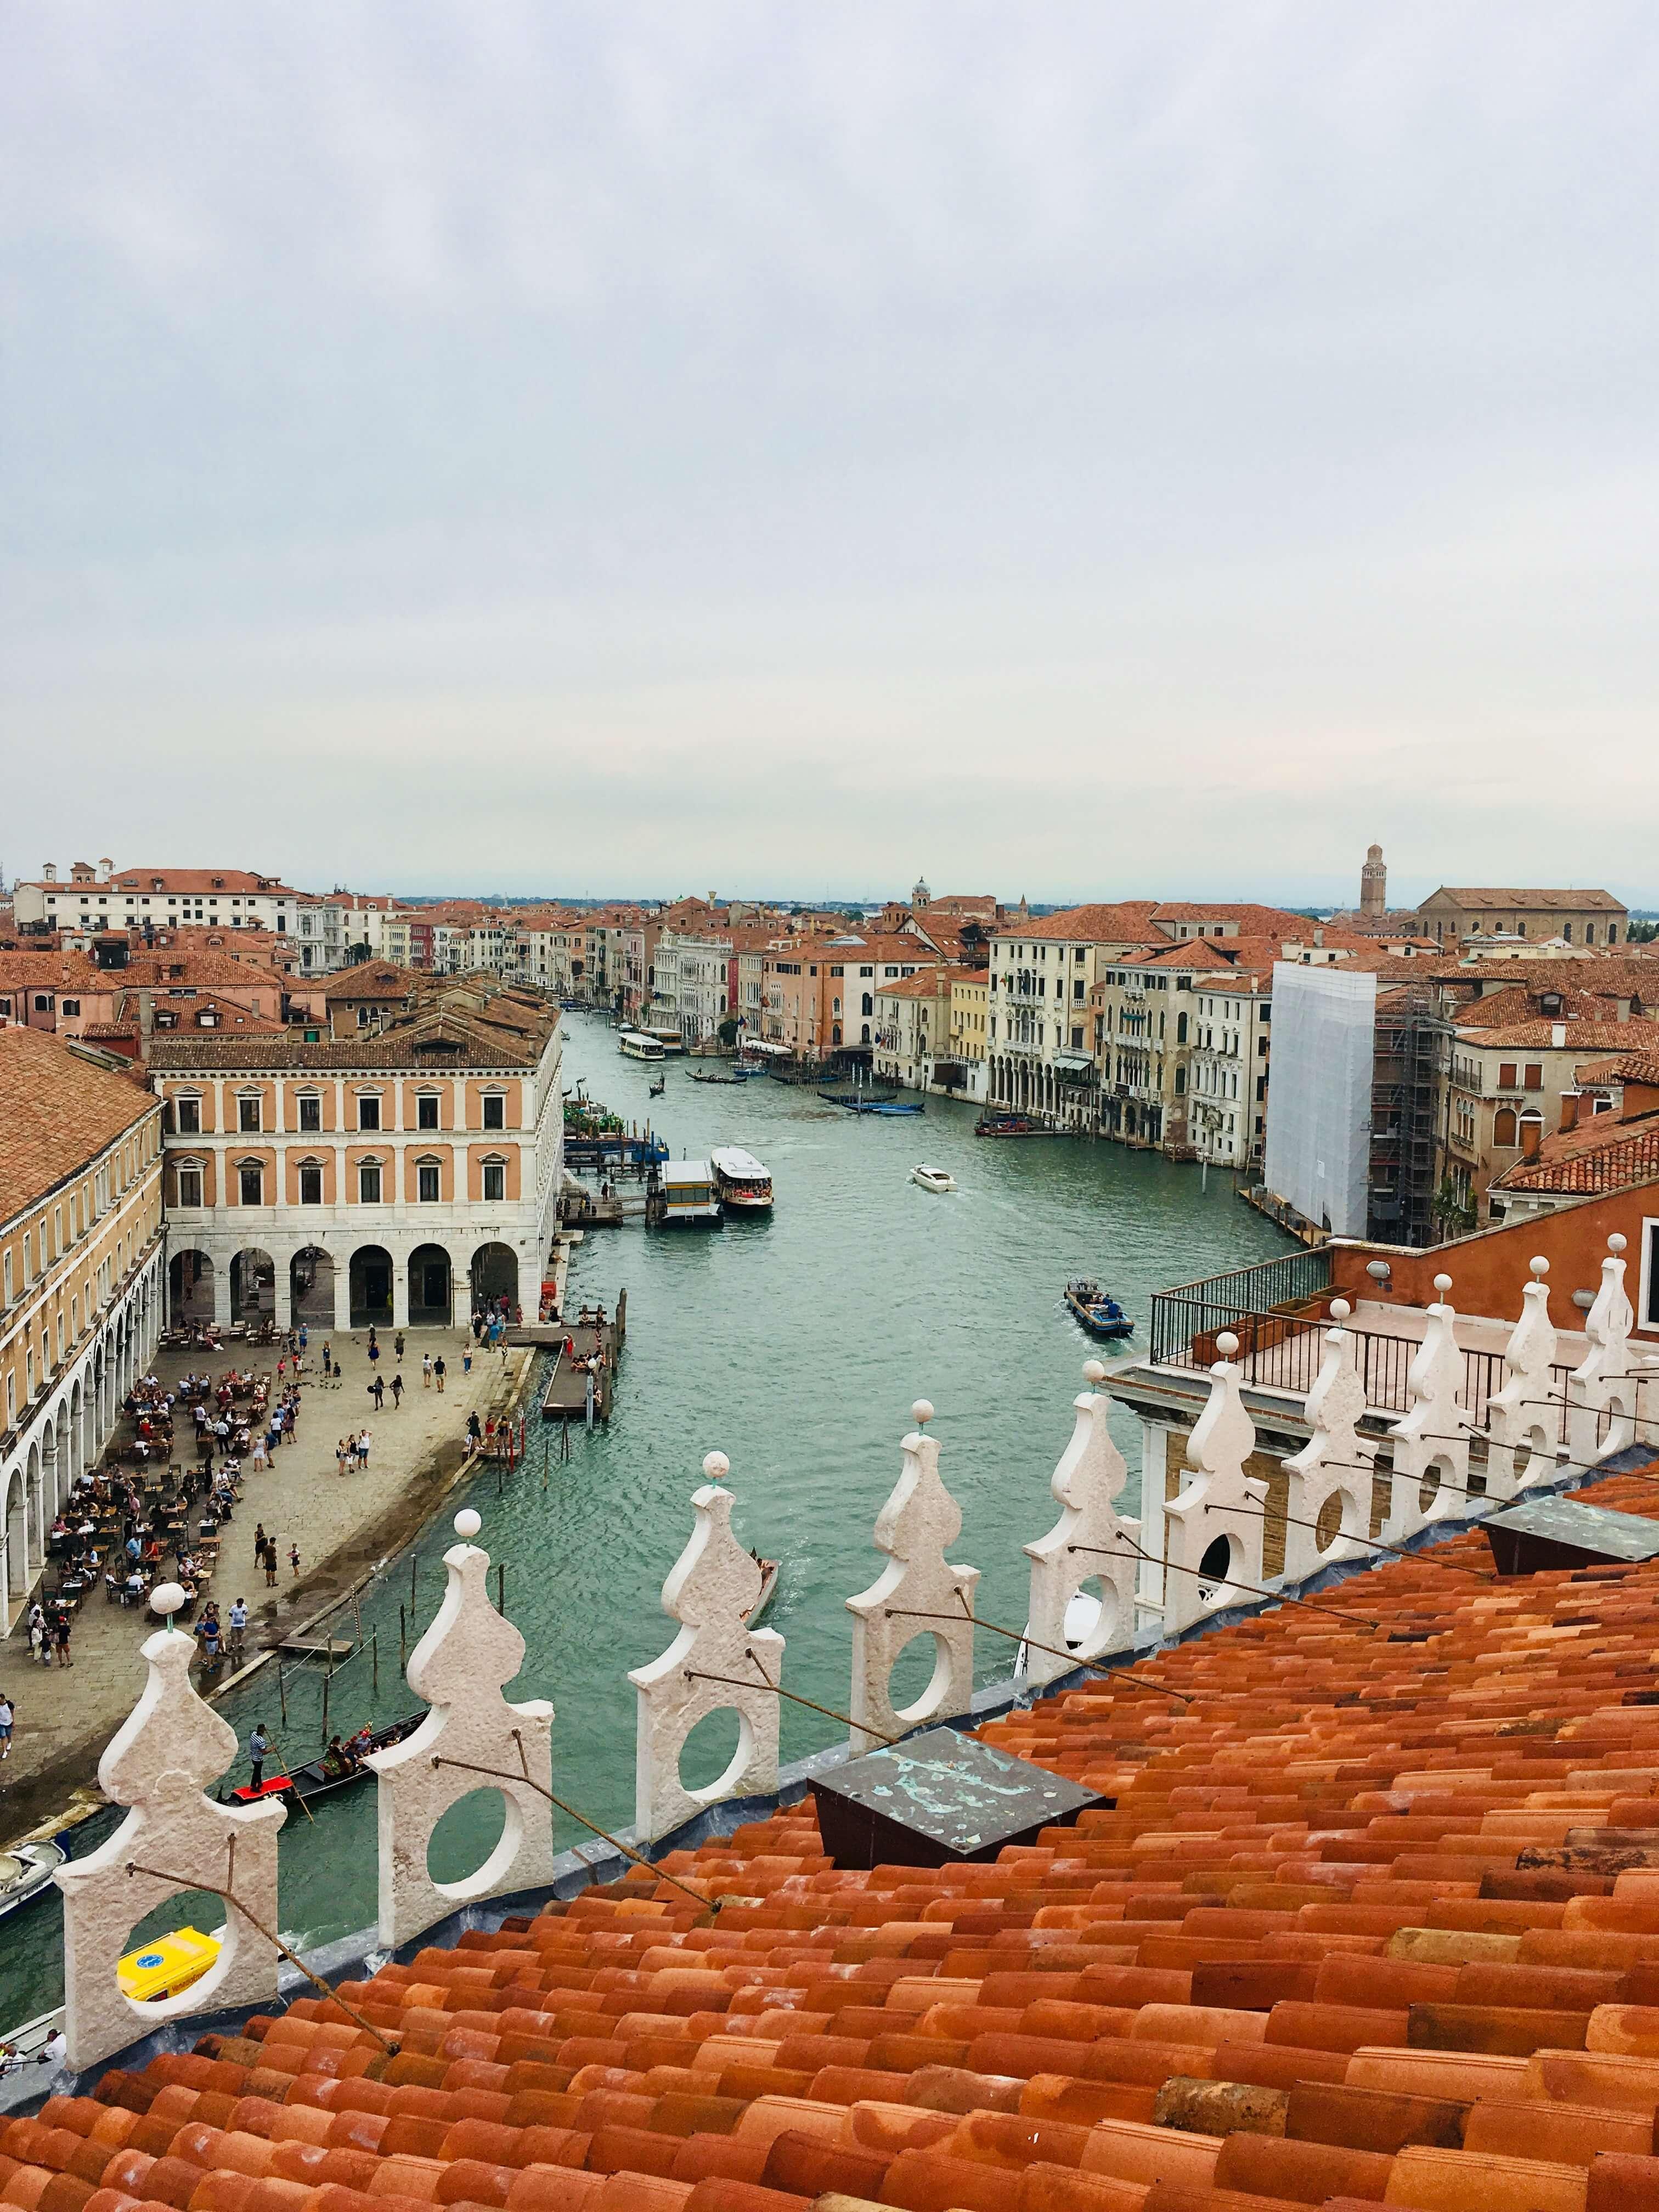 T Fondaco Dei Tedeschi Rooftop Terrace In Venice Luggage